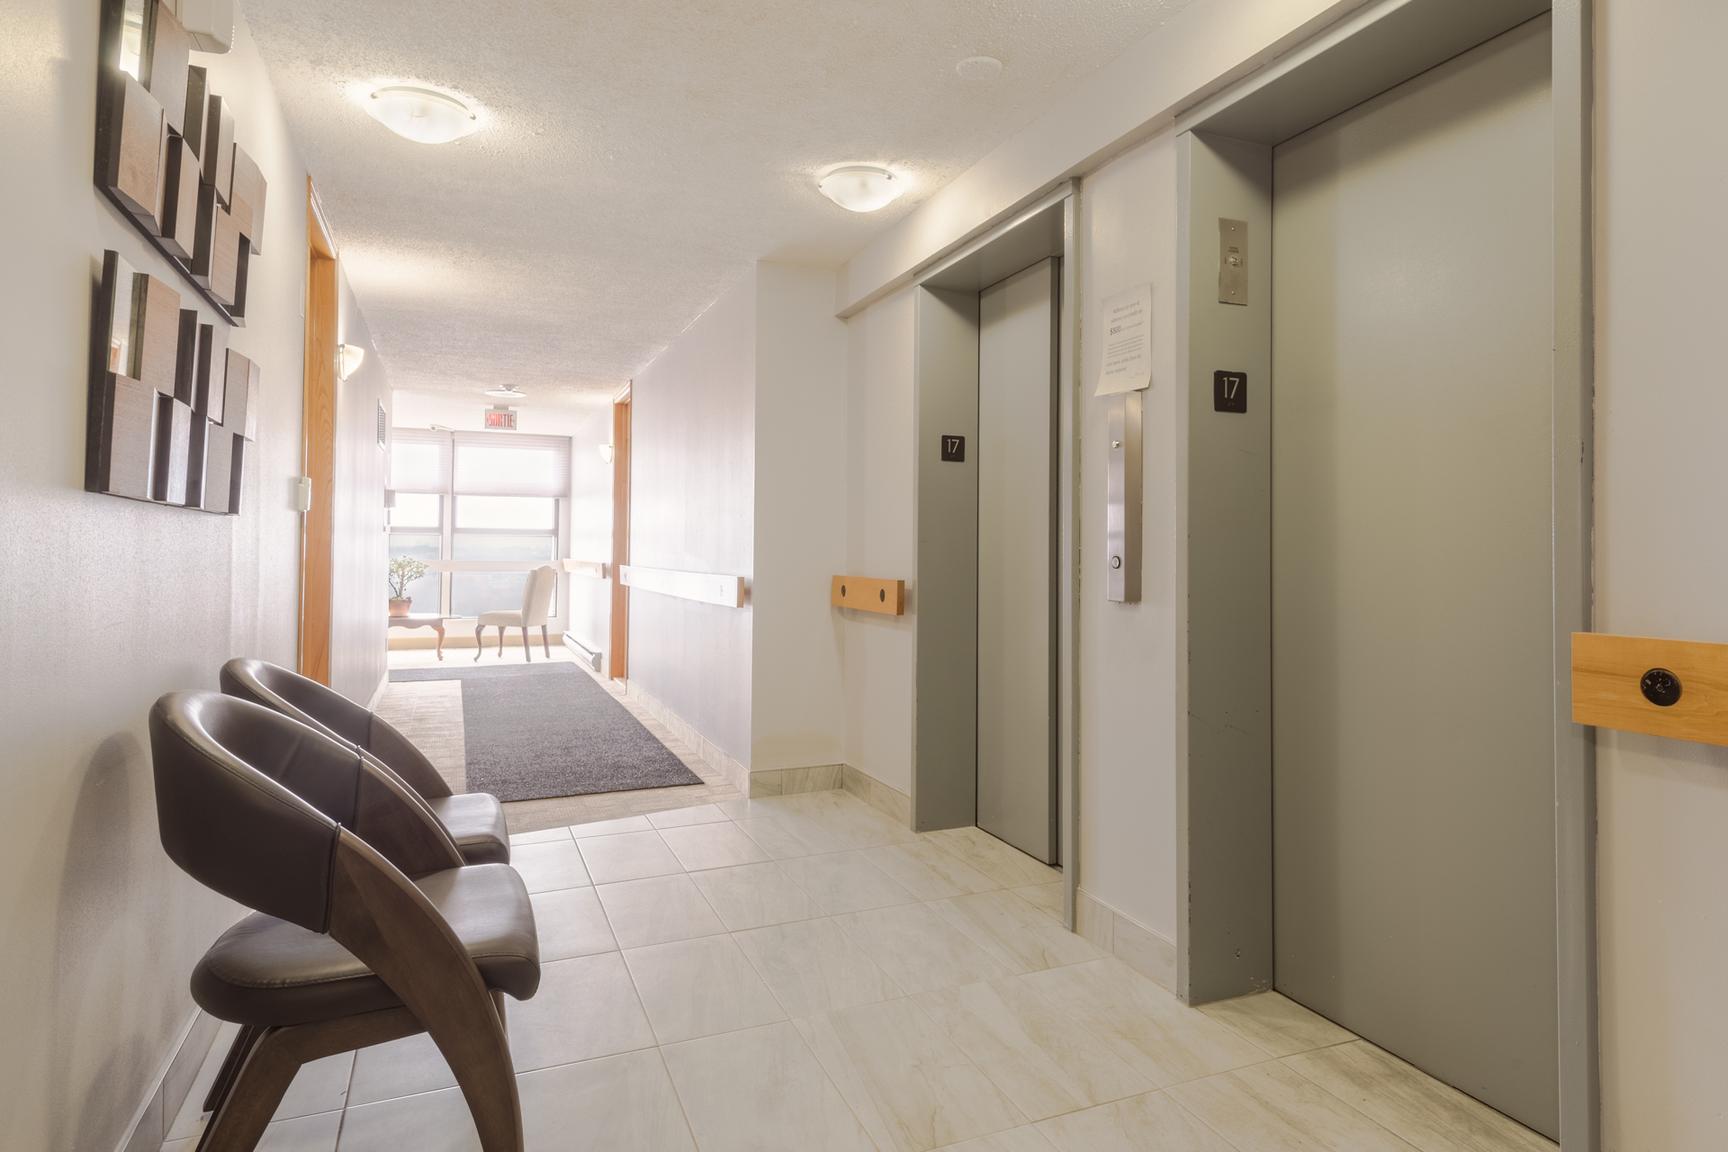 1 bedroom Apartments for rent in Laval at Le Quatre Cent - Photo 28 - RentQuebecApartments – L407184